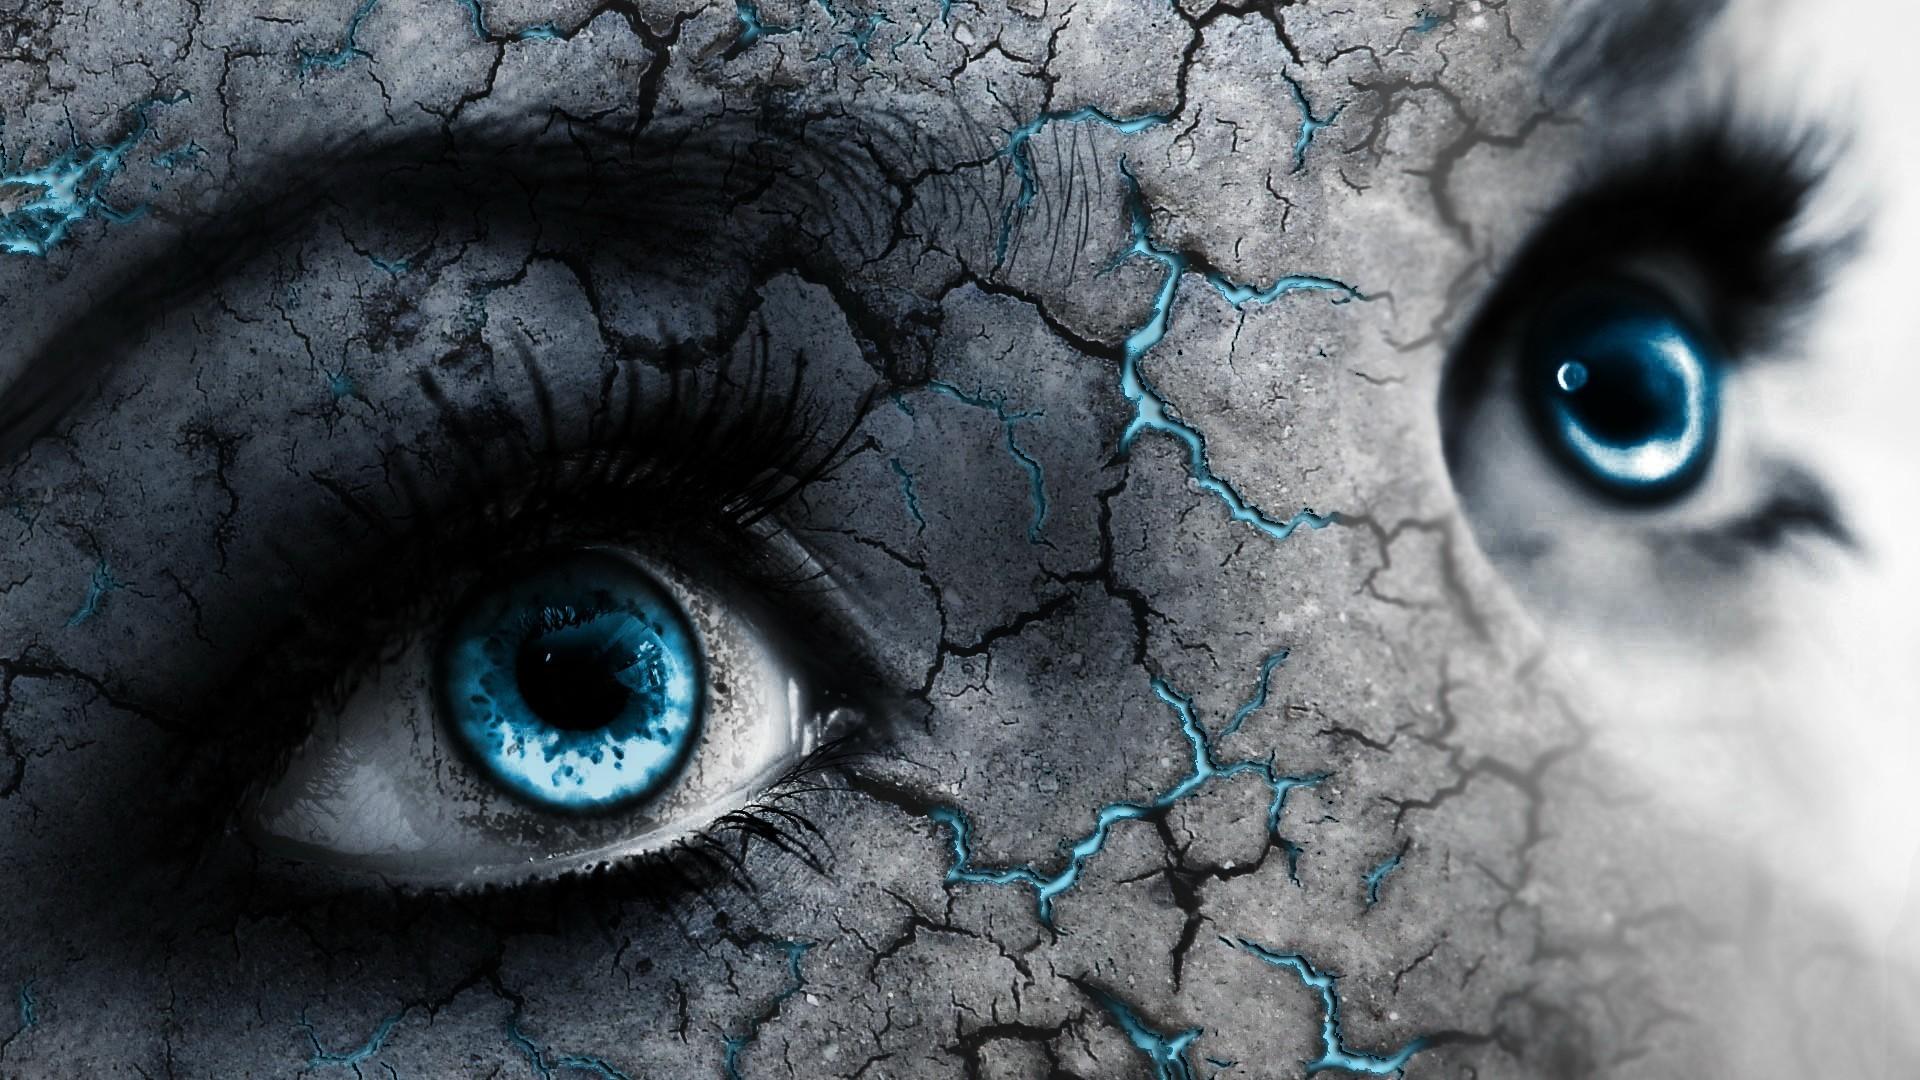 Digital Art Backgrounds on Wallpapers Vista